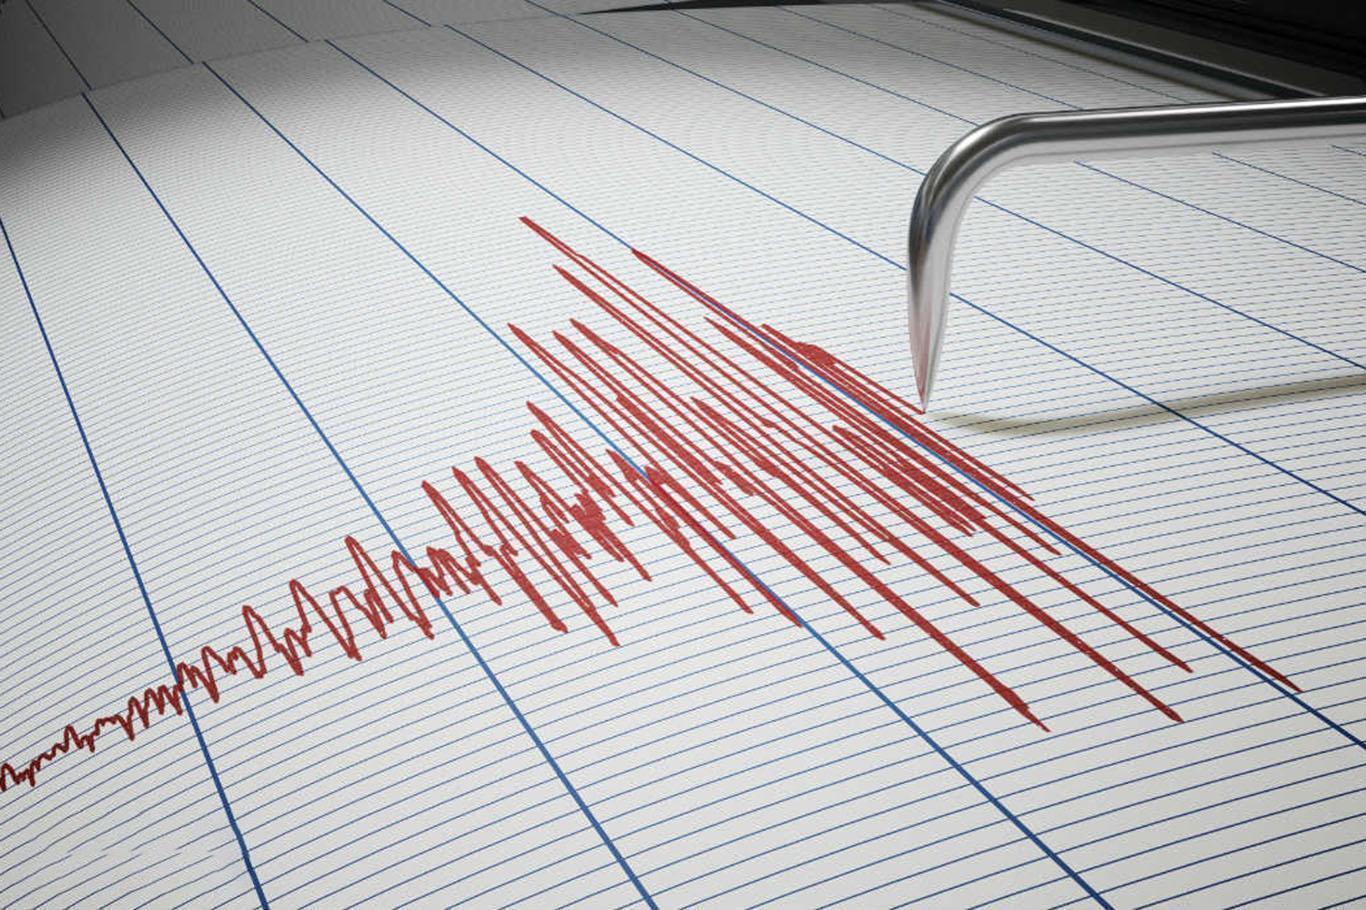 A 5.6-magnitude earthquake hits Yasuj and Sisakht cities in Iran